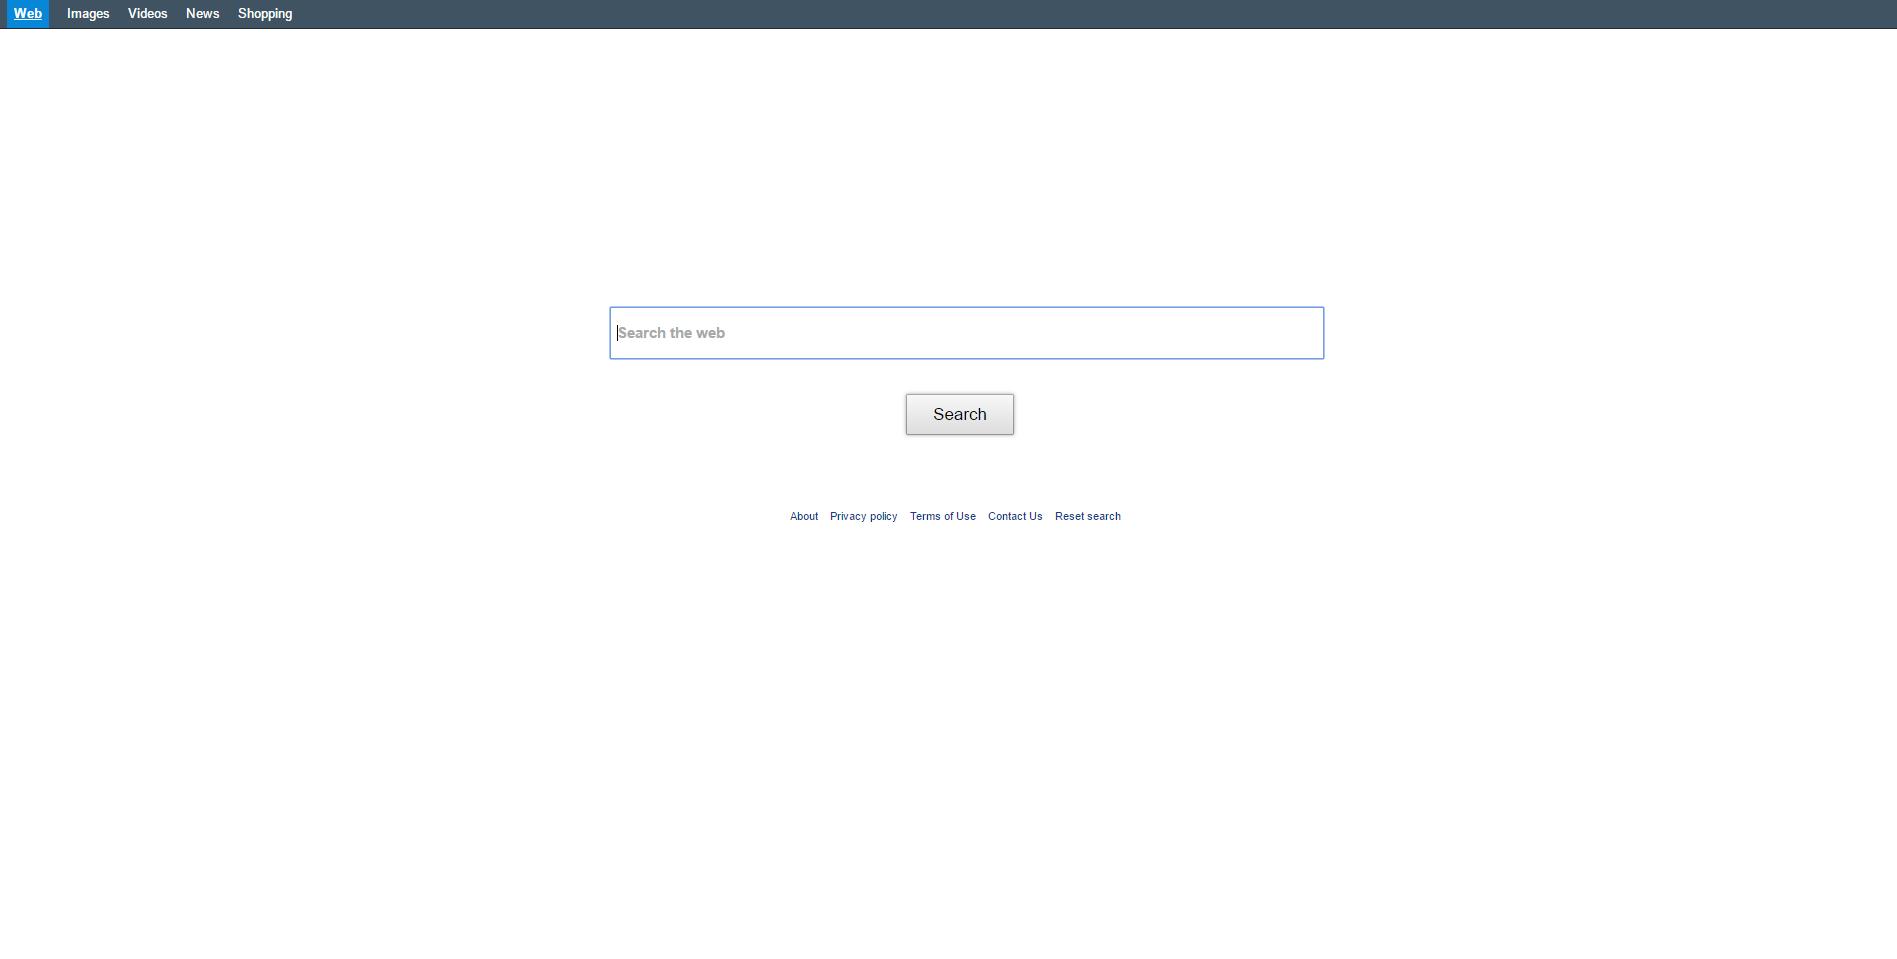 Search.celipsow.com Ads